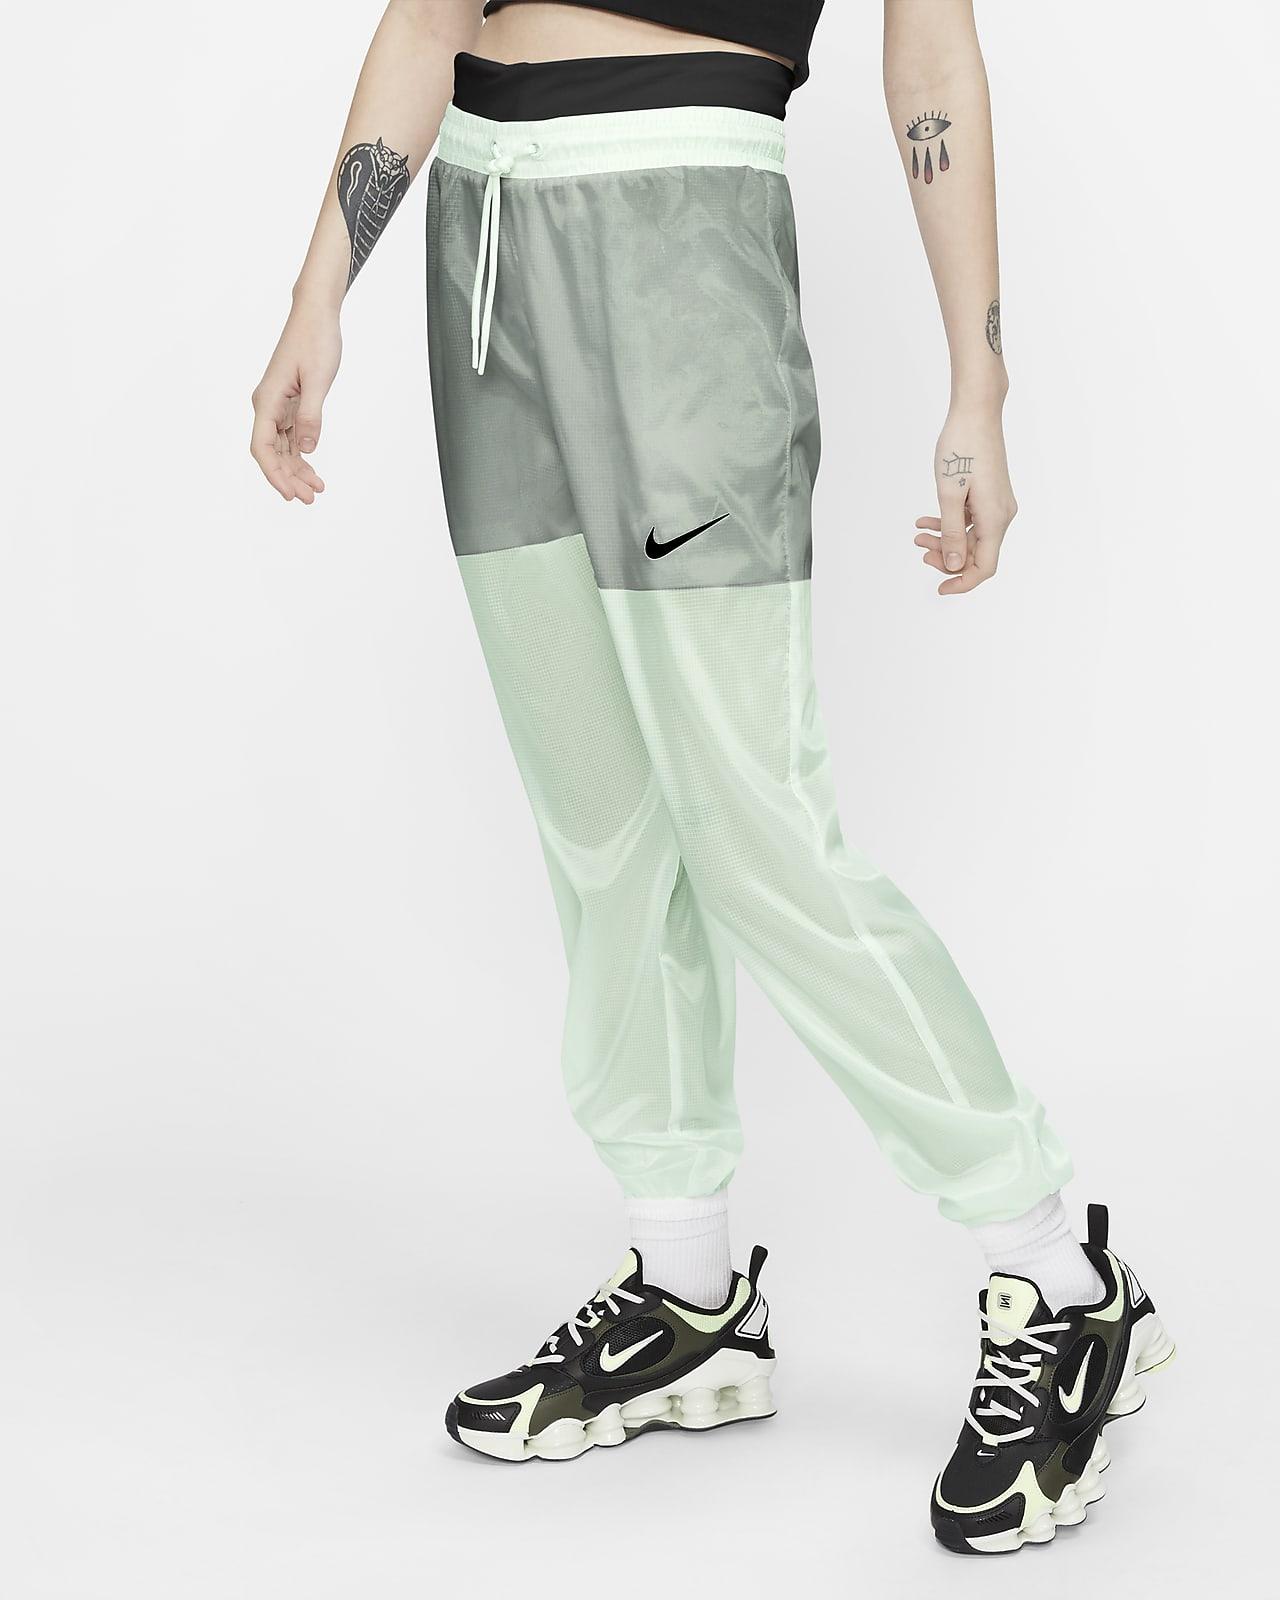 Nike Sportswear vevd damebukse